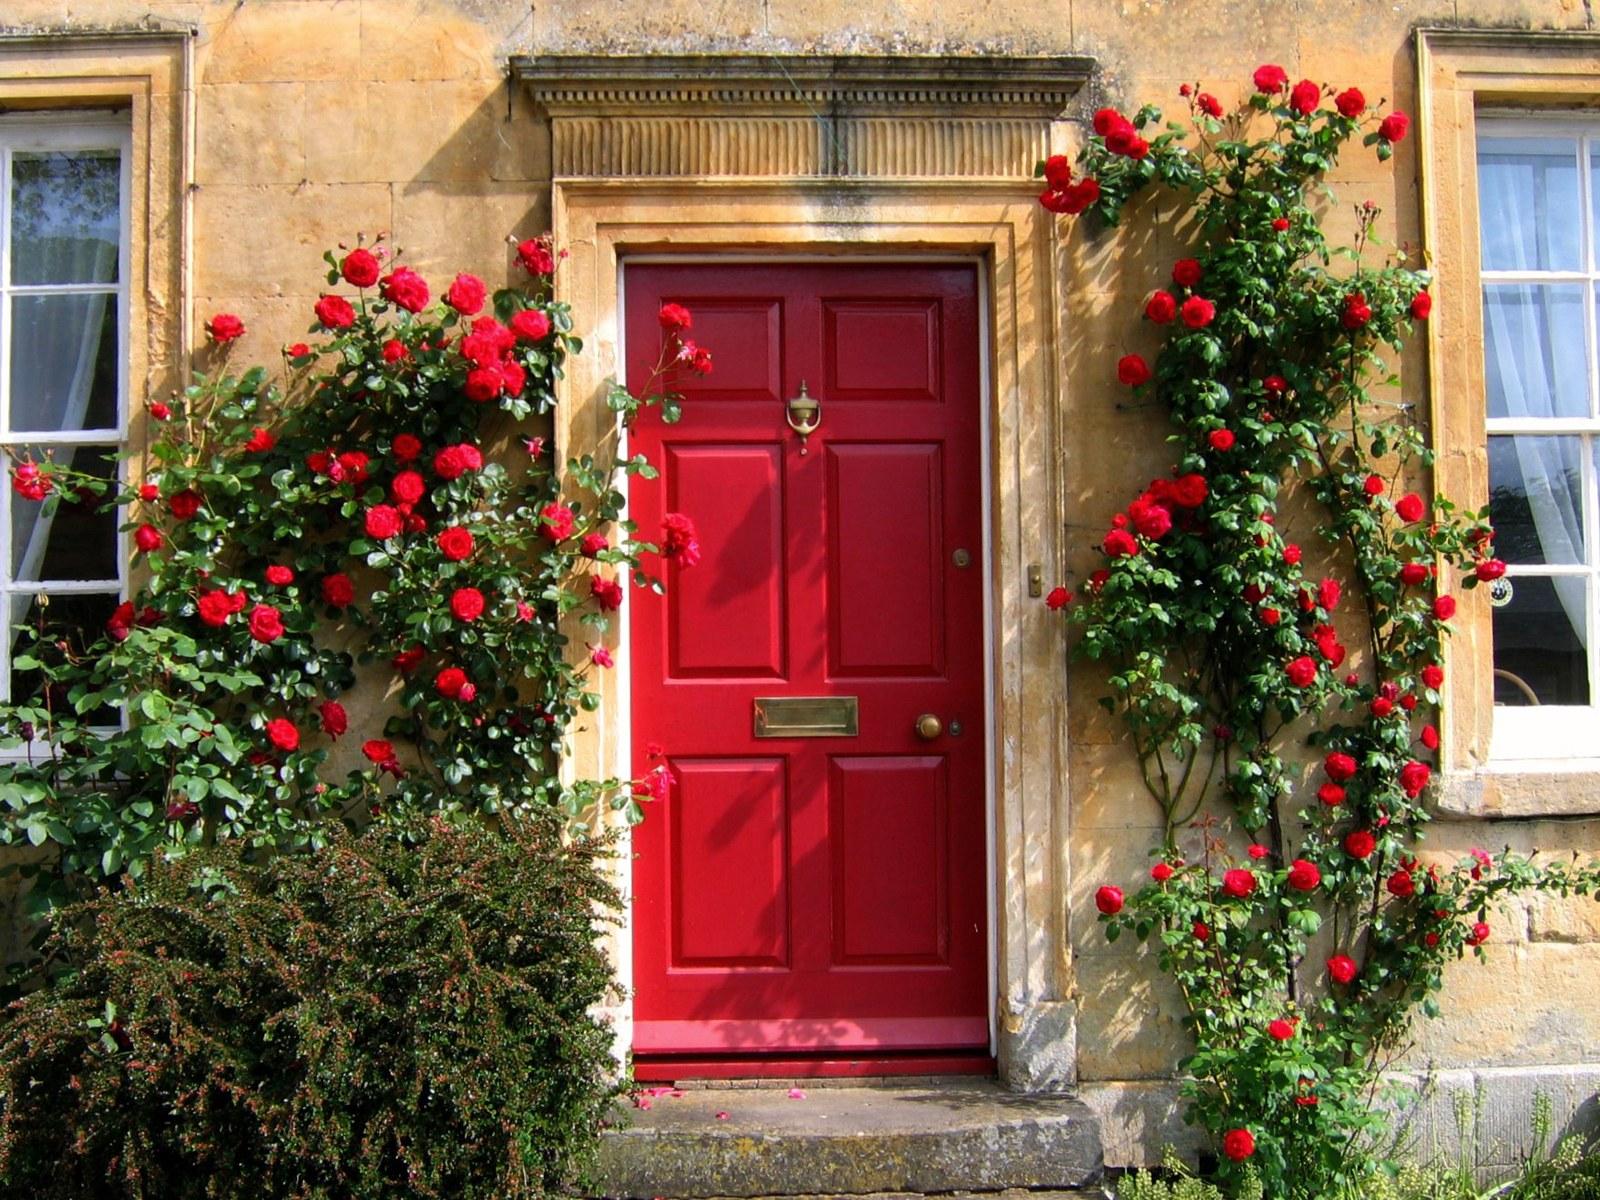 Red Garden Ornaments